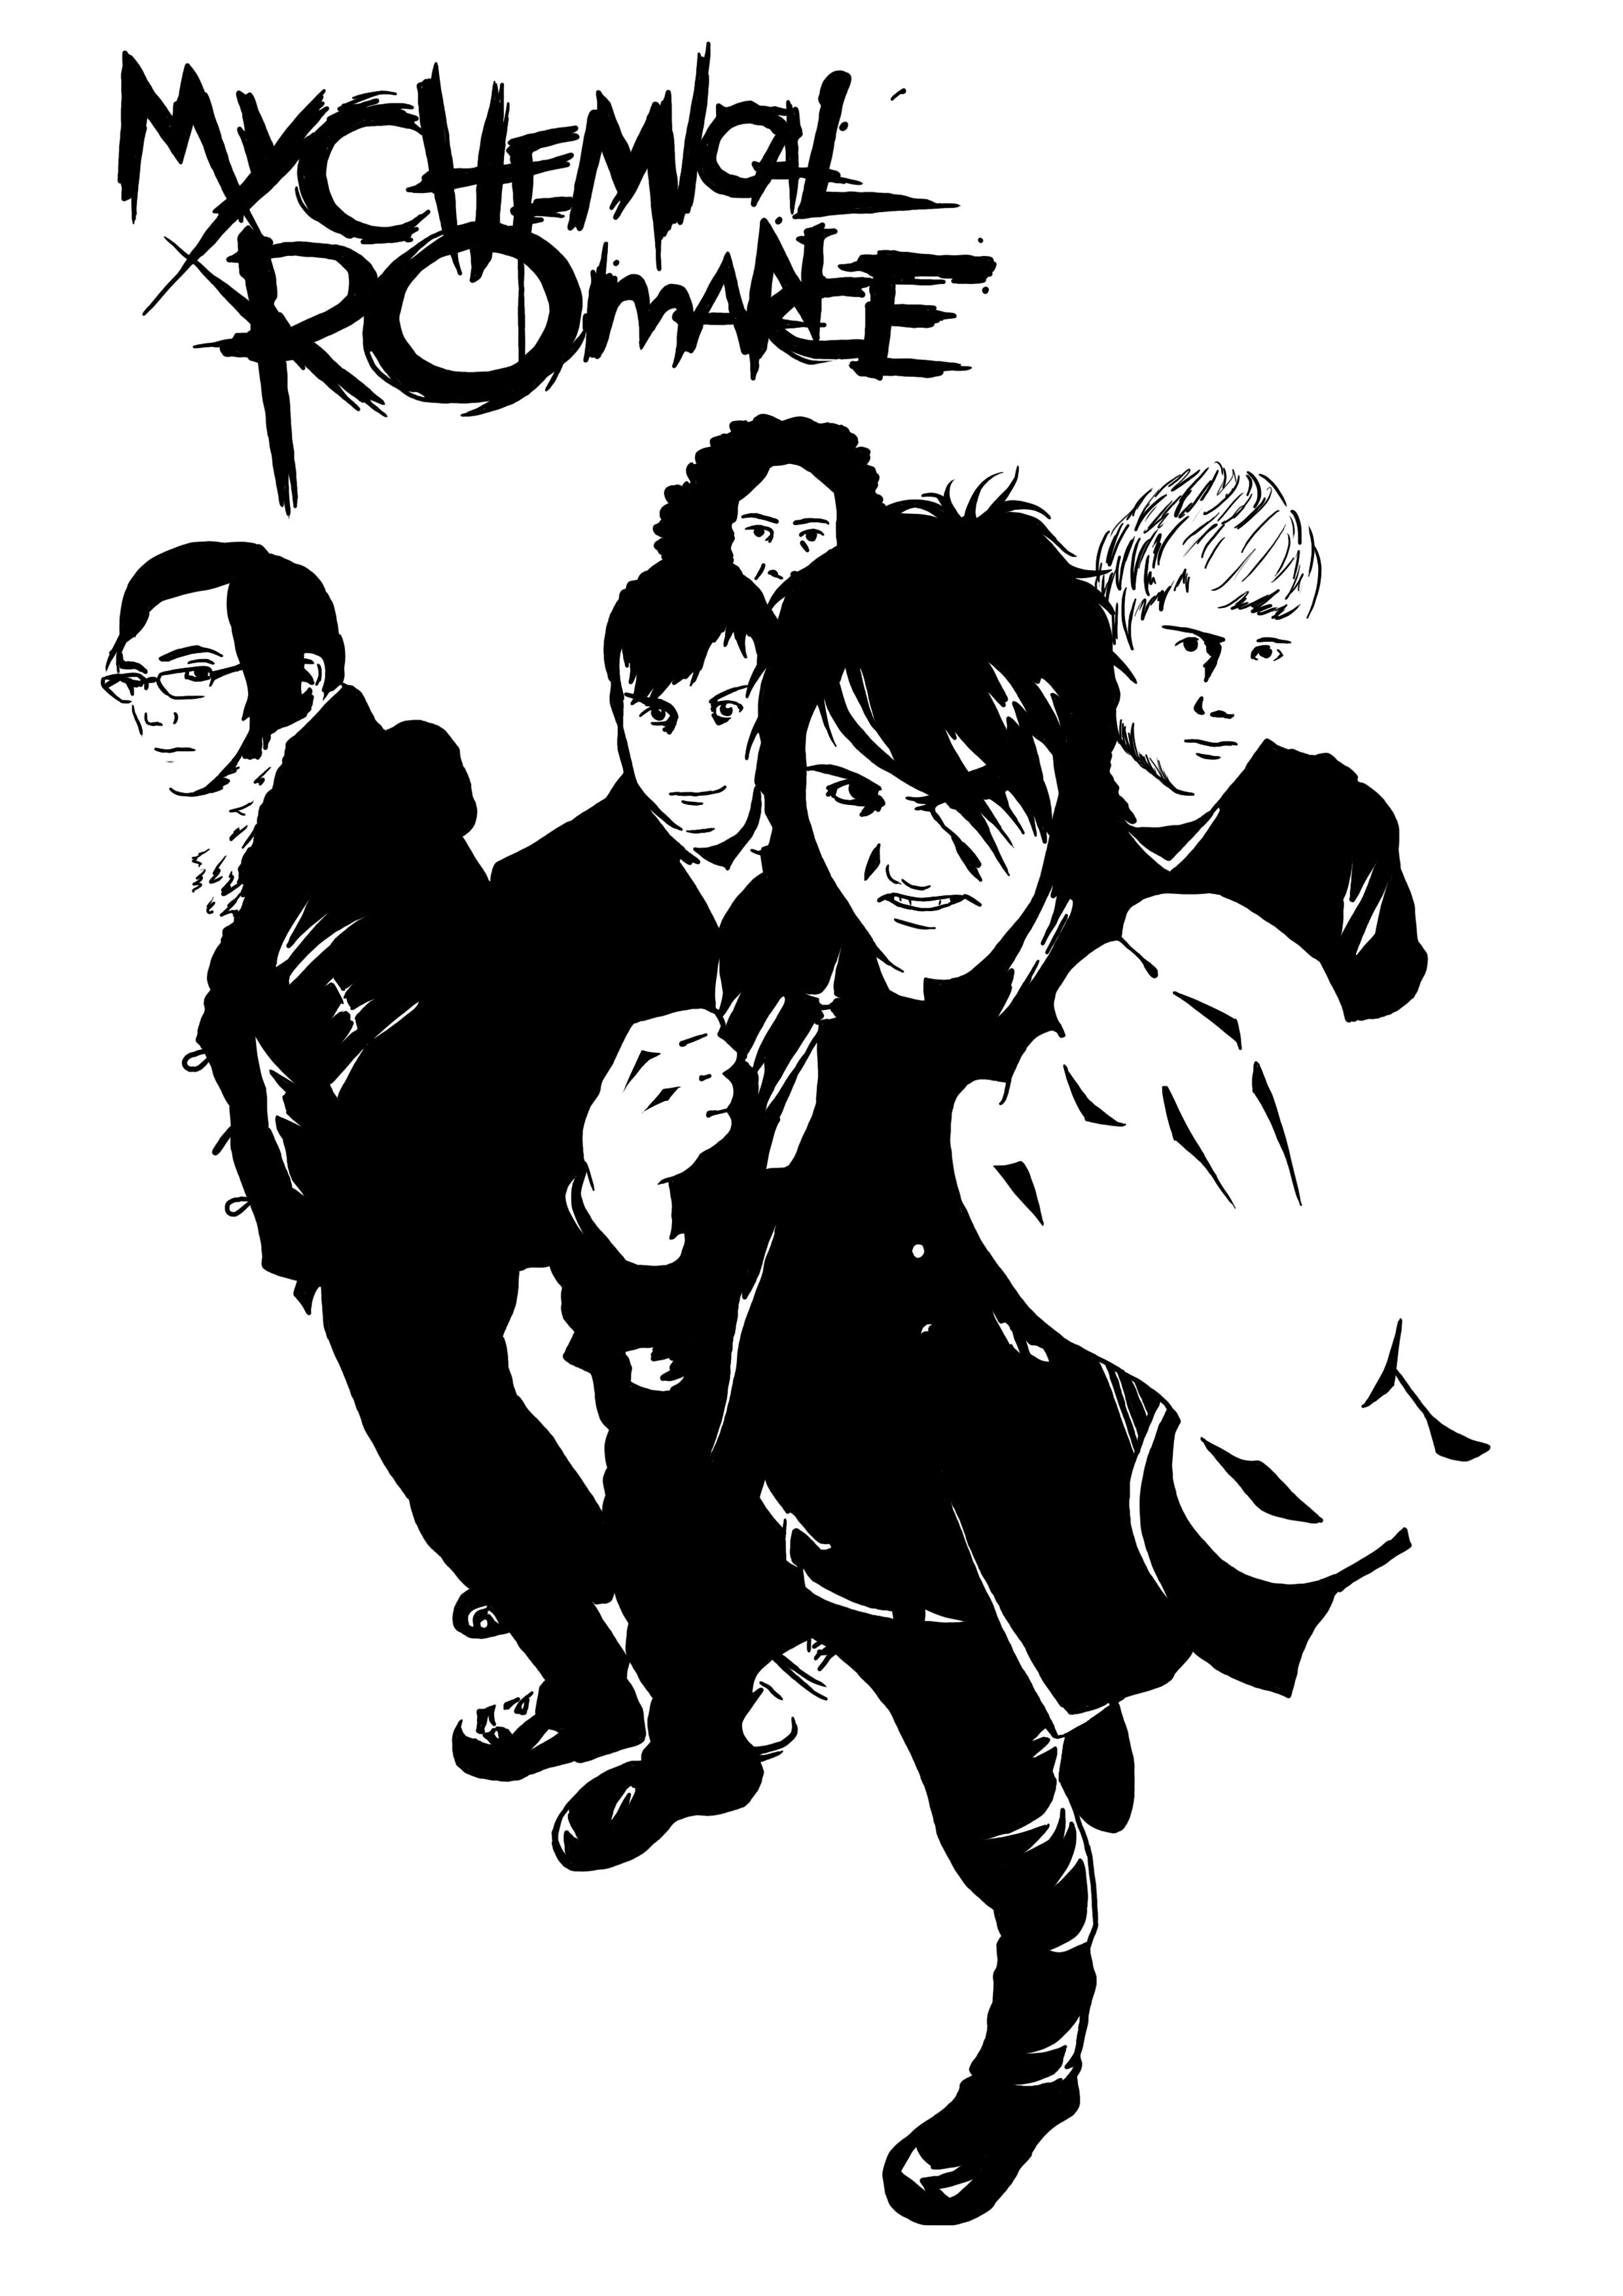 Mcr iphone wallpaper tumblr - My Chemical Romance